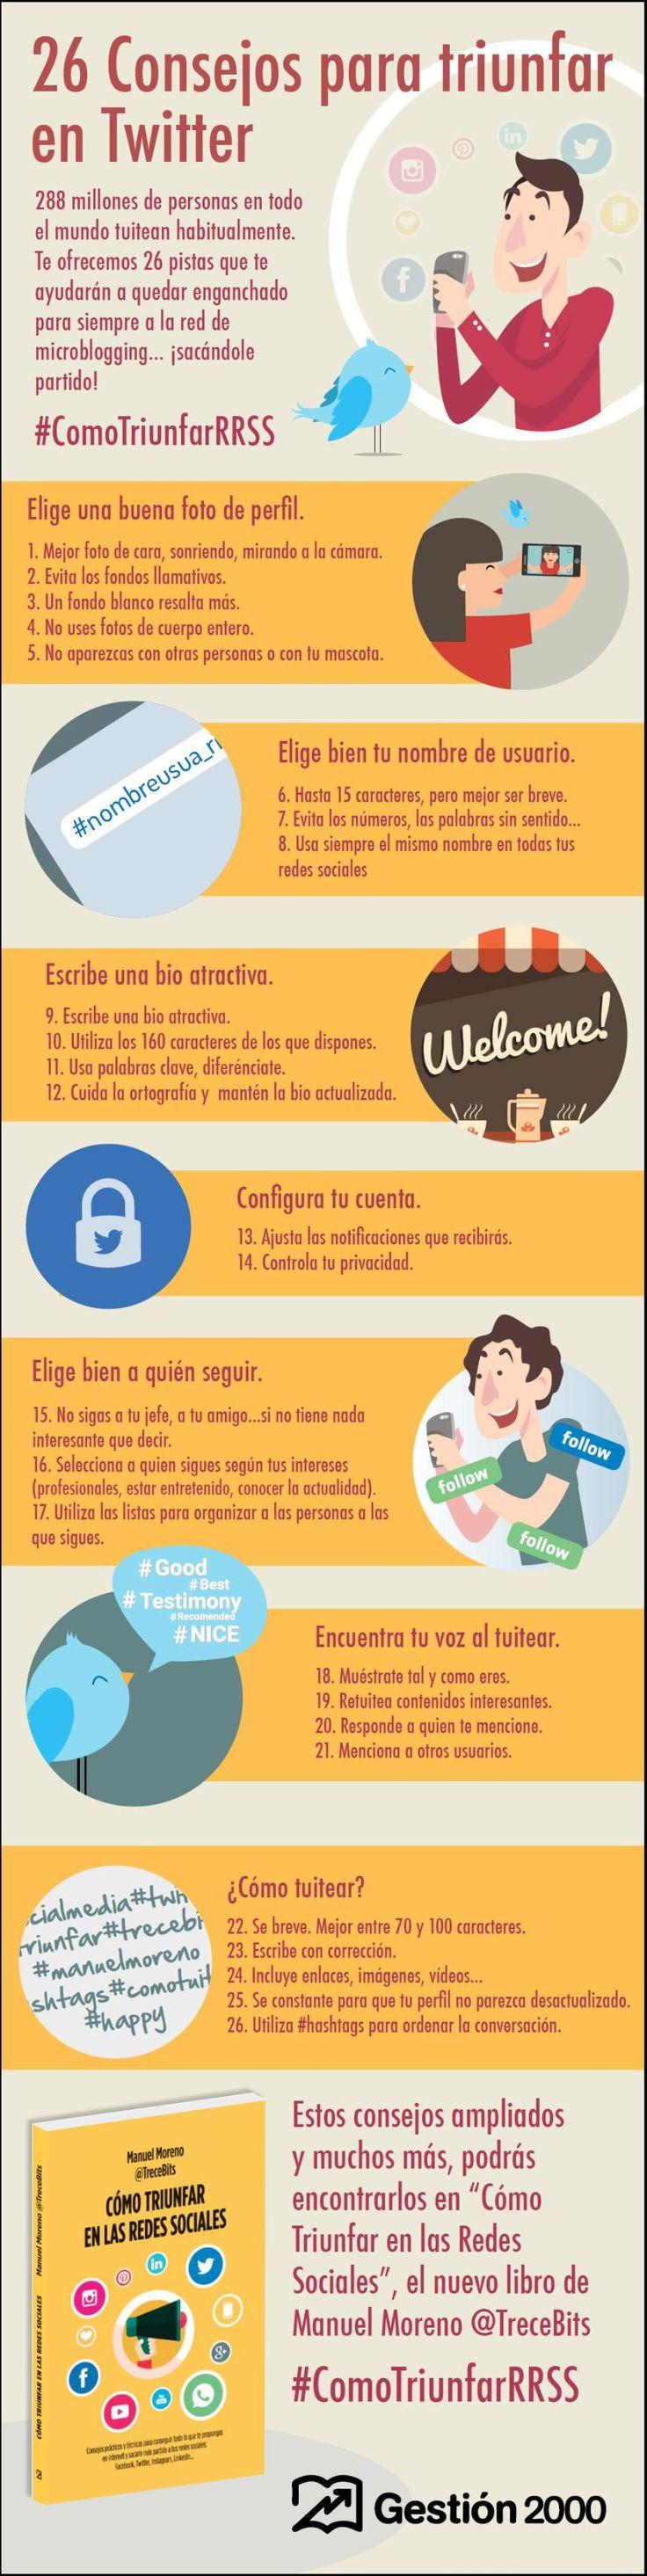 26 consejos para triunfar en Twitter #infografia #infographic #socialmedia